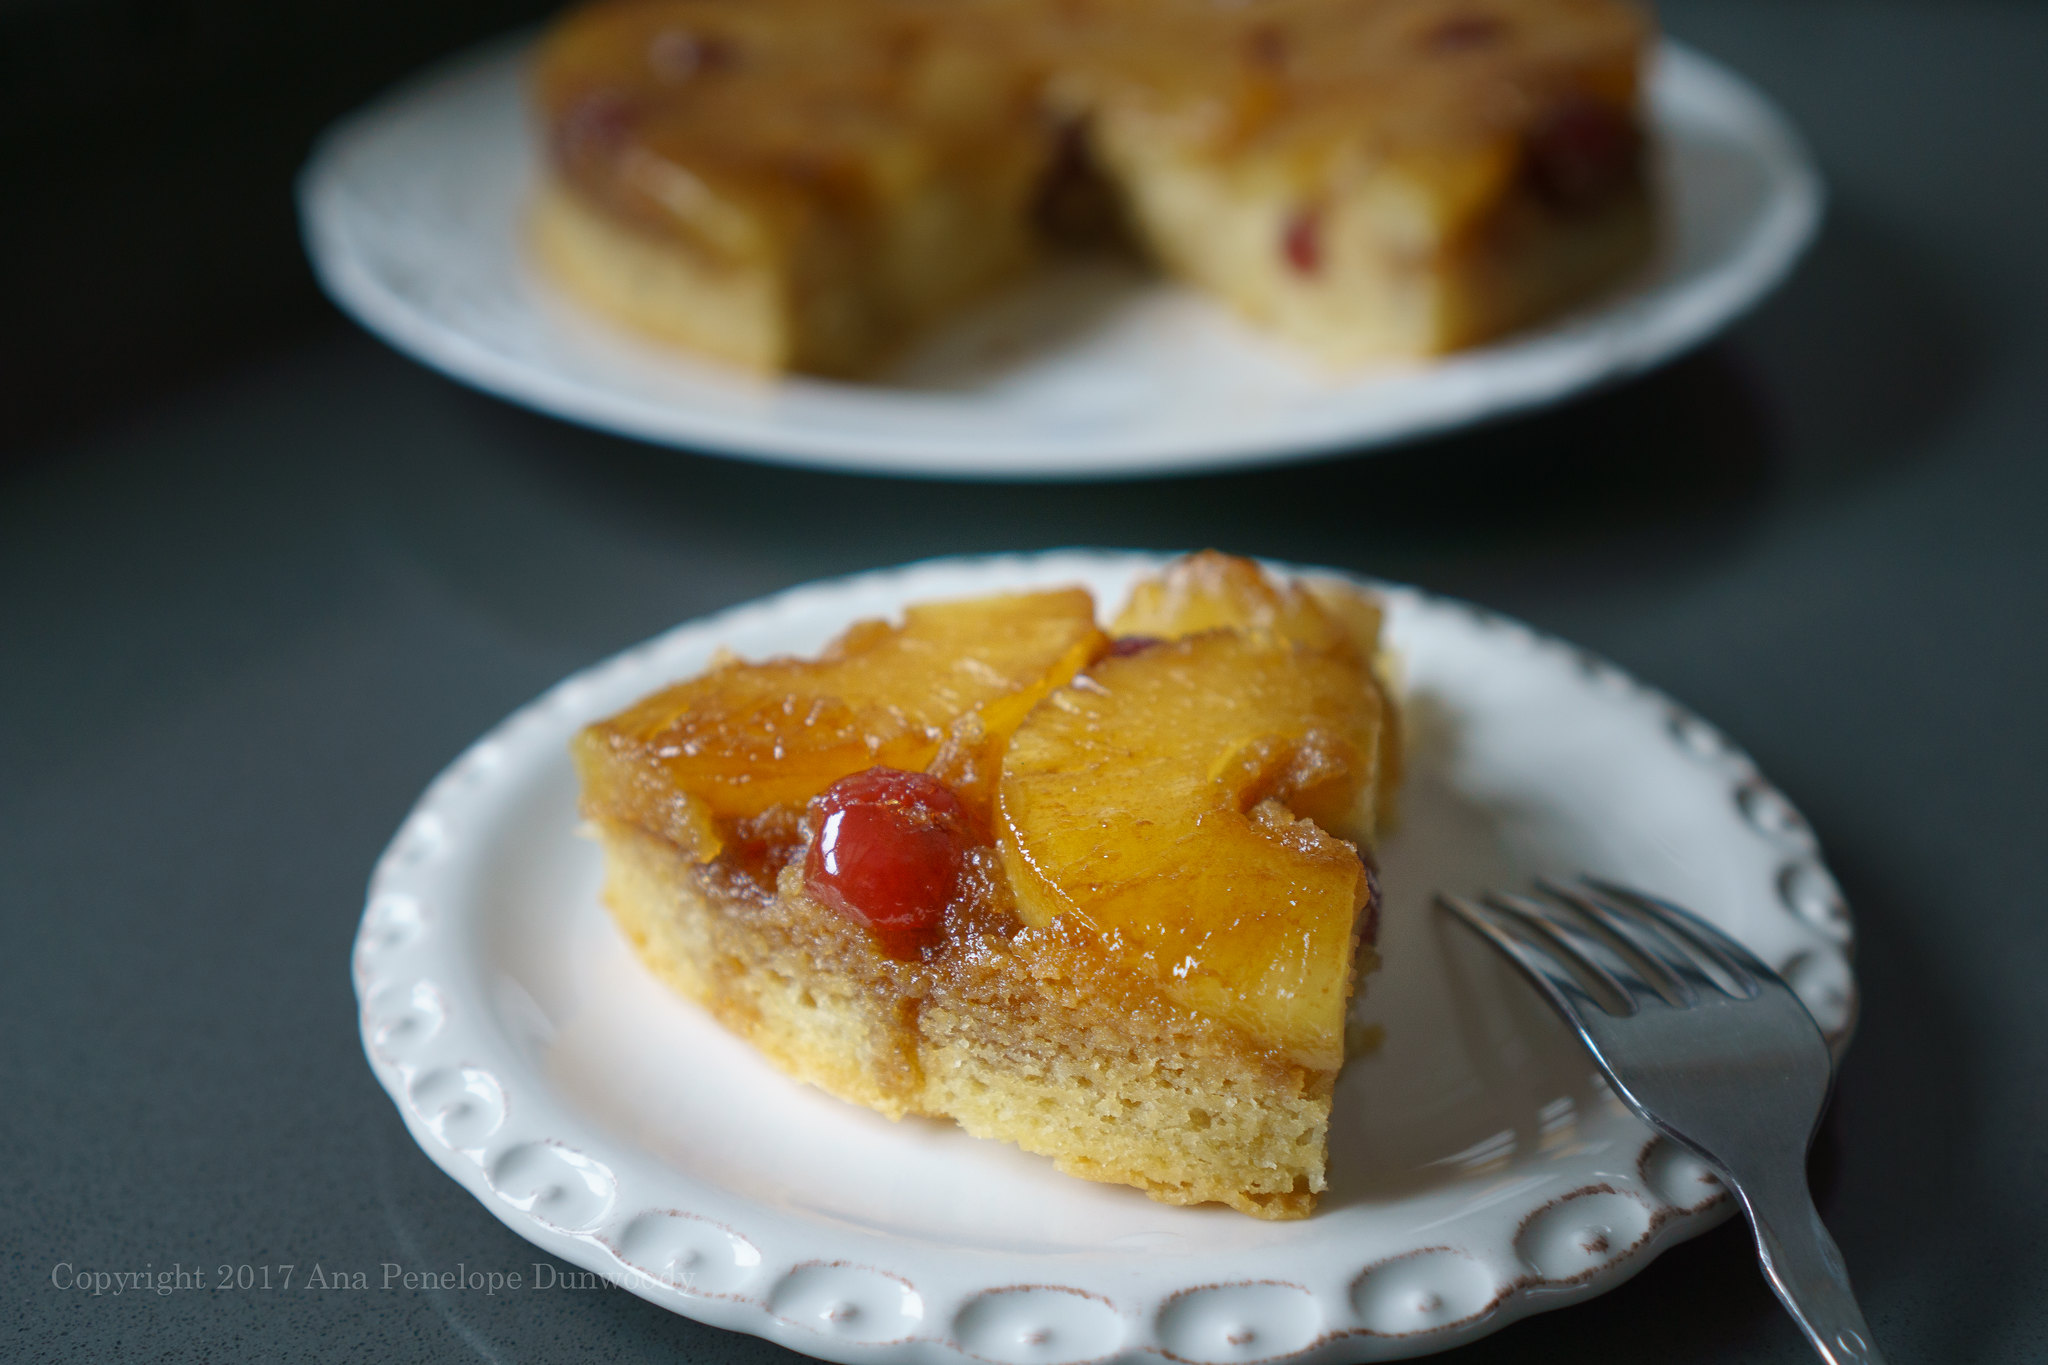 Pineapple Upside Down Cake #4